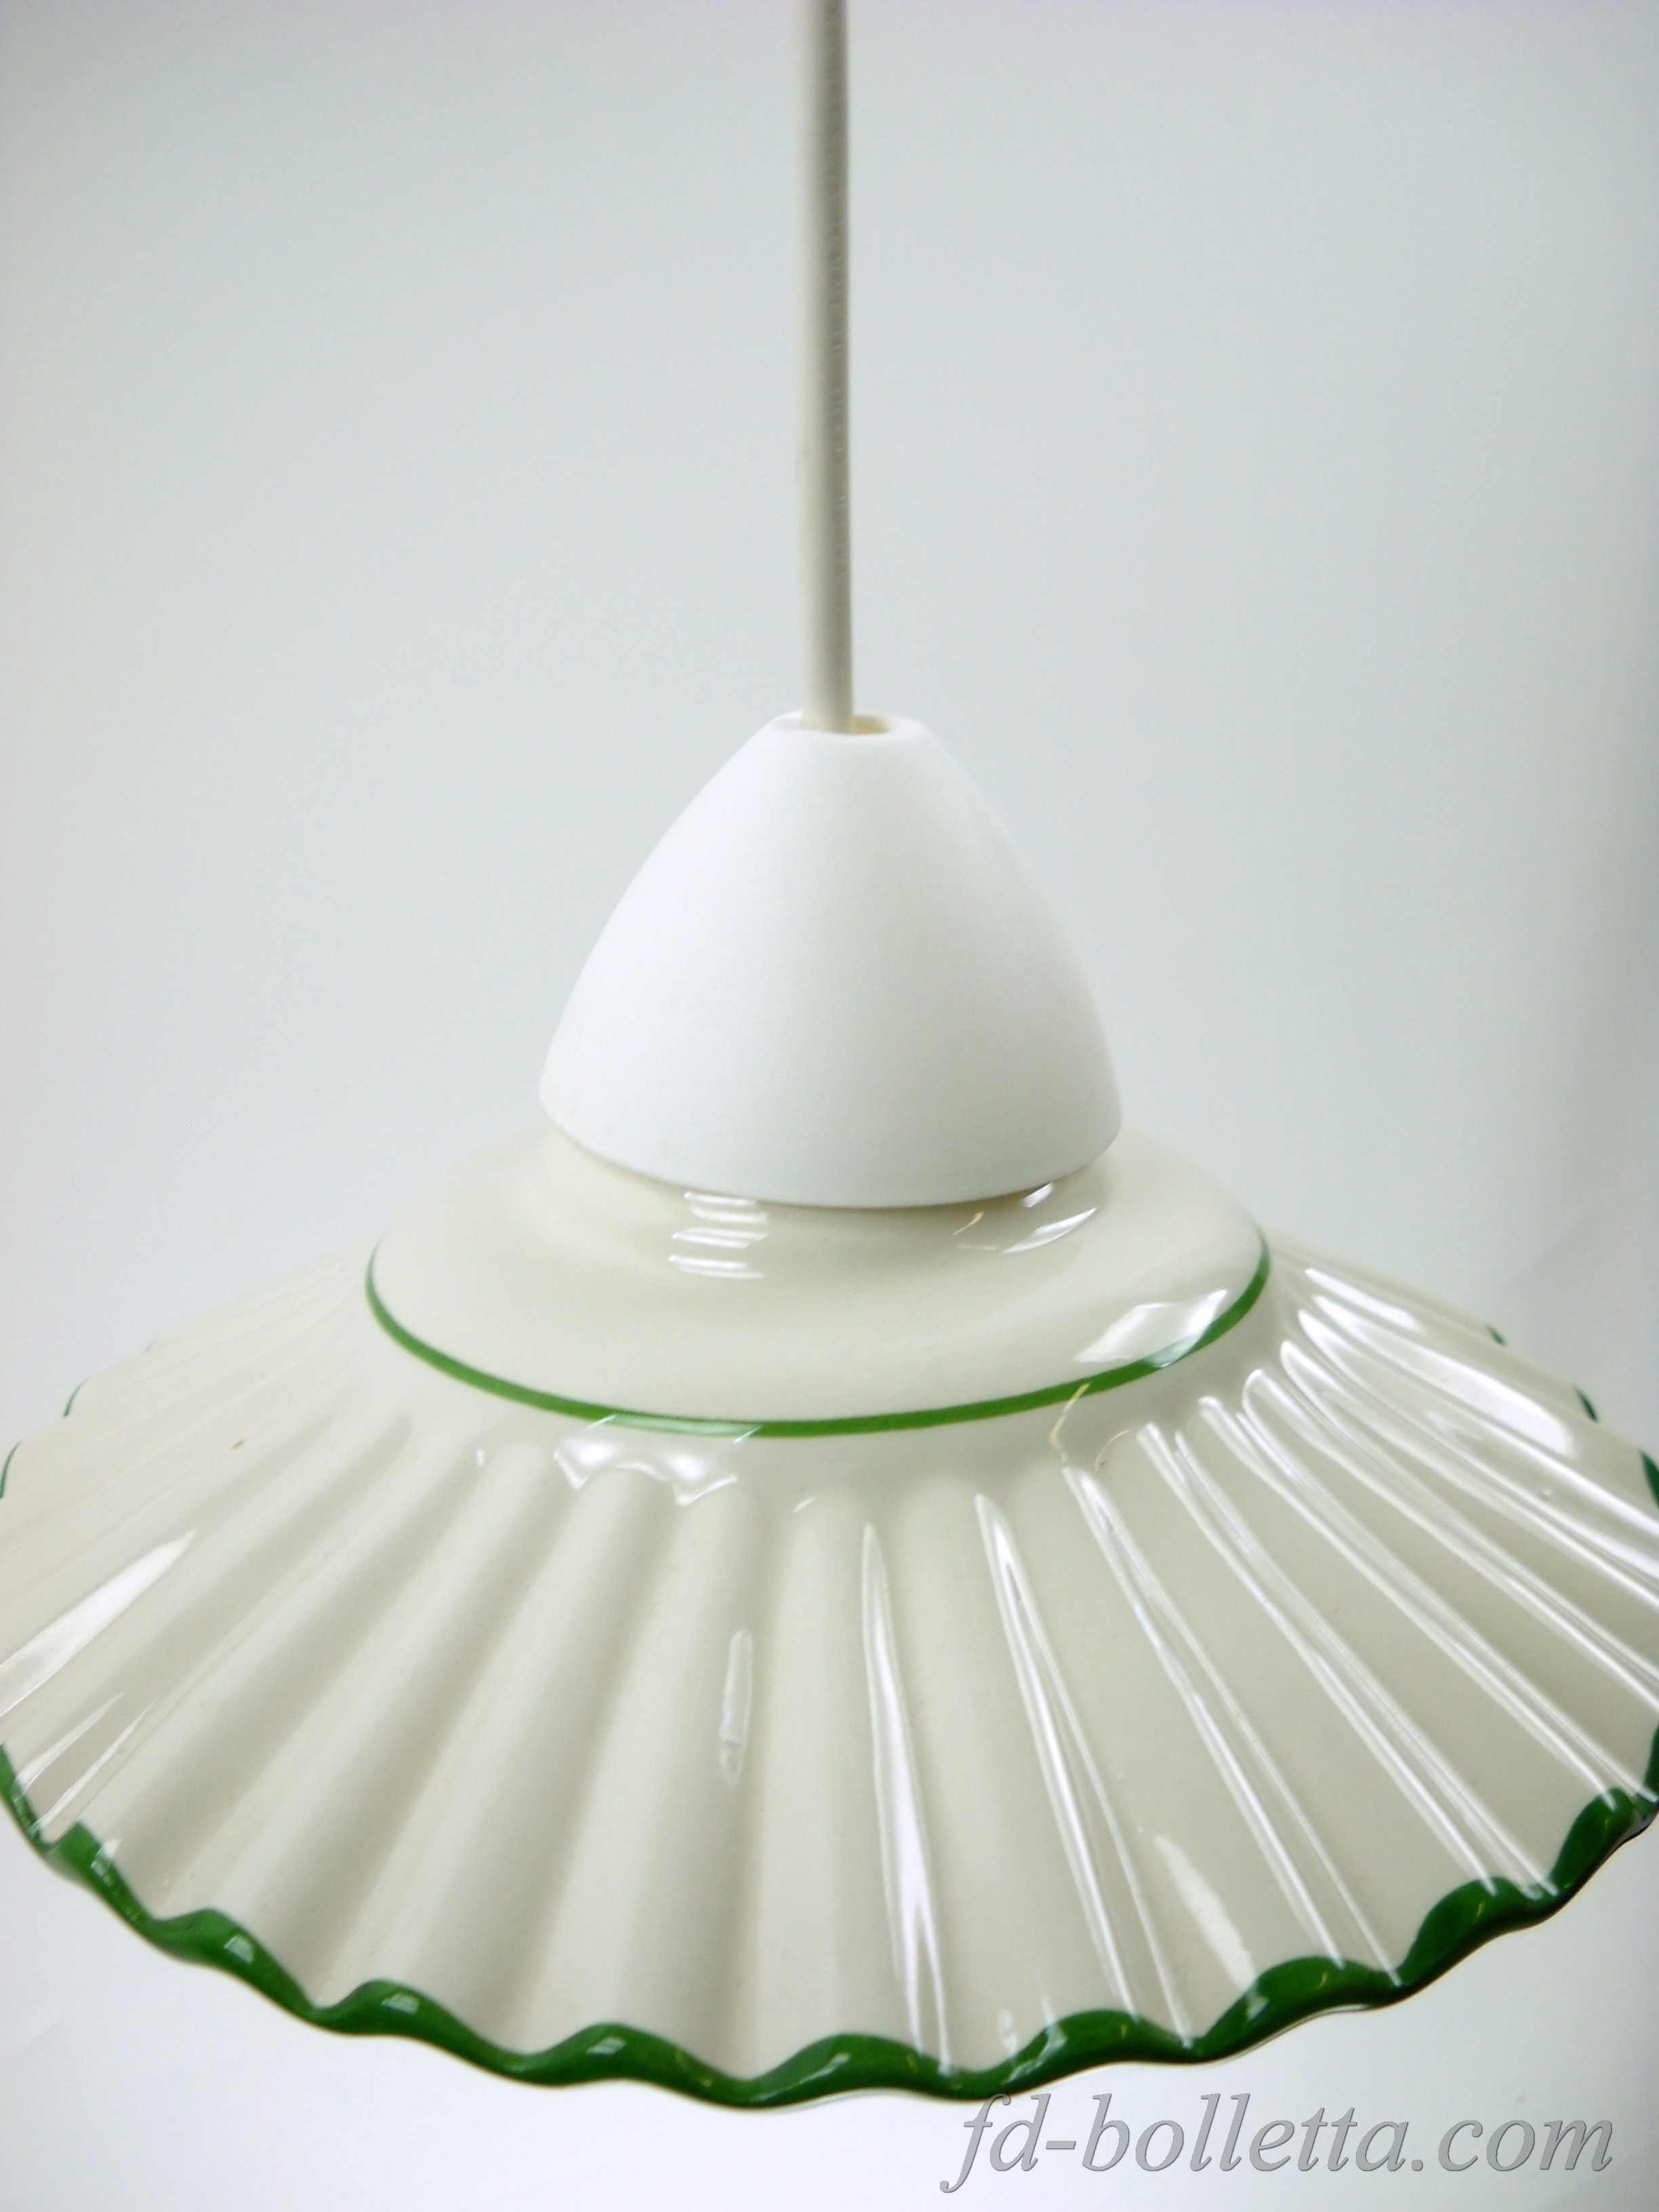 lampadari usati : Lampadario in plastica l1039 - fd-bolletta lampade